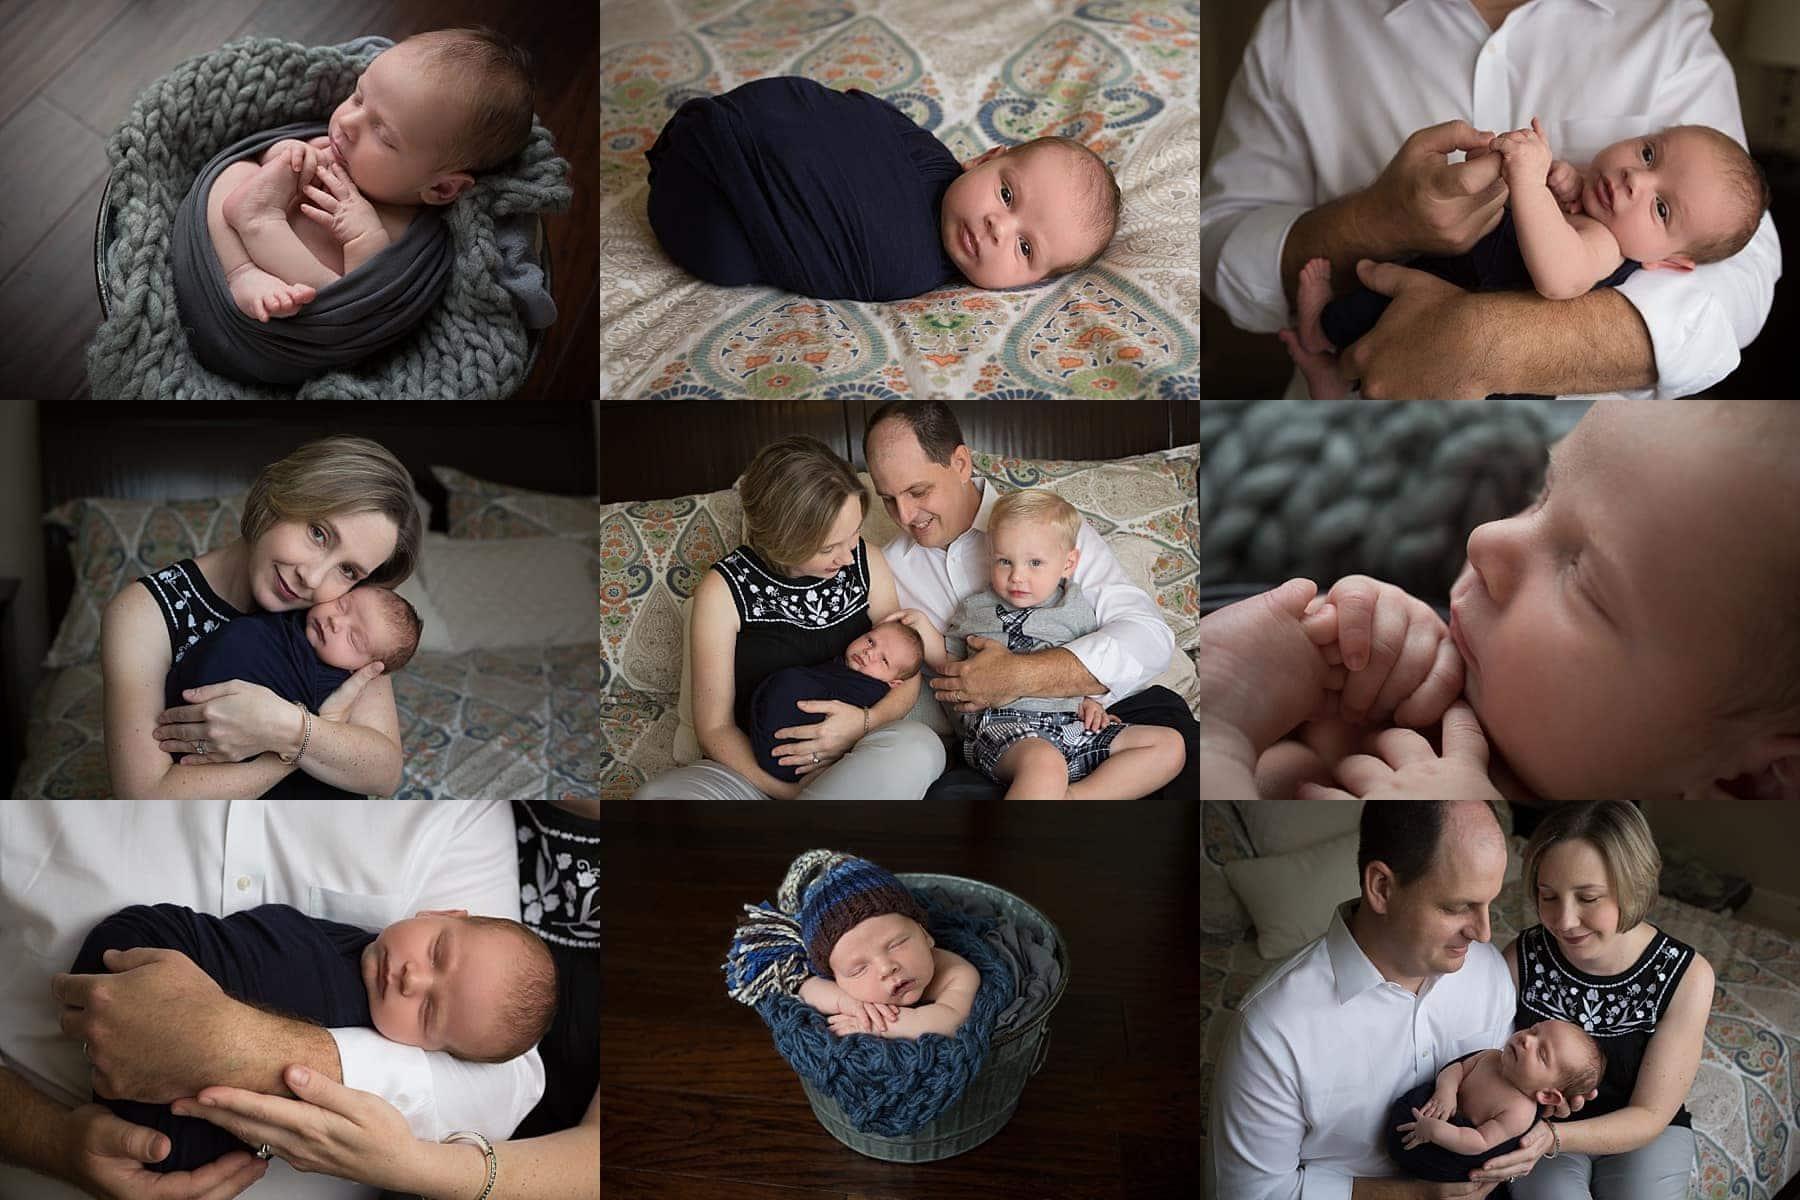 newborn boy photo session at home in San Antonio, Texas